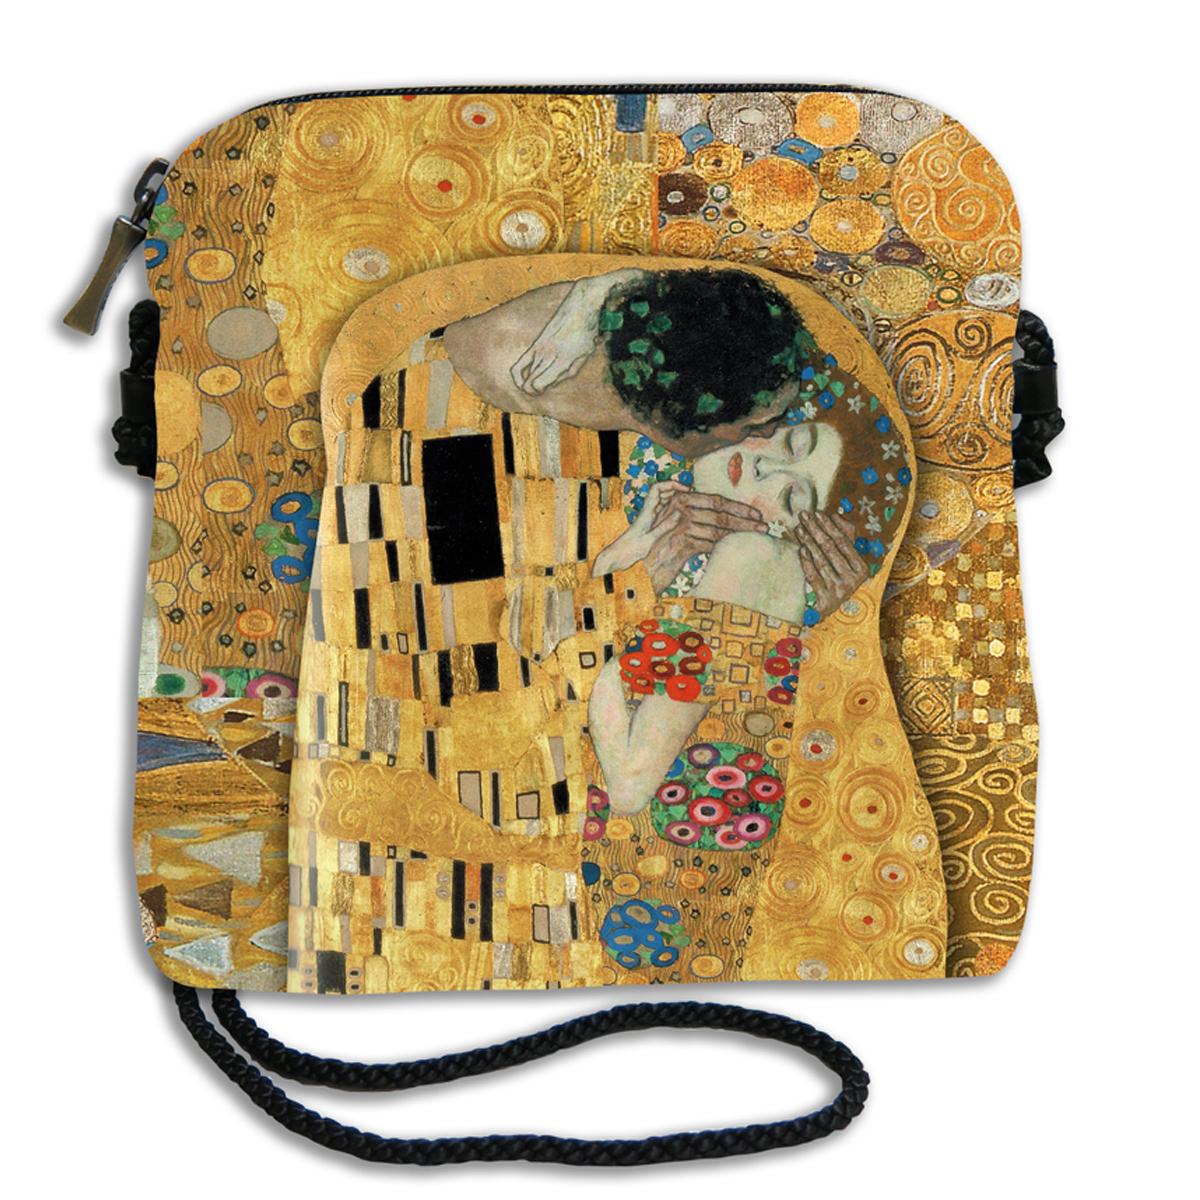 Sac bandoulière artisanal \'Gustav Klimt\' (la Baiser)  - 18x17 cm - [Q6658]